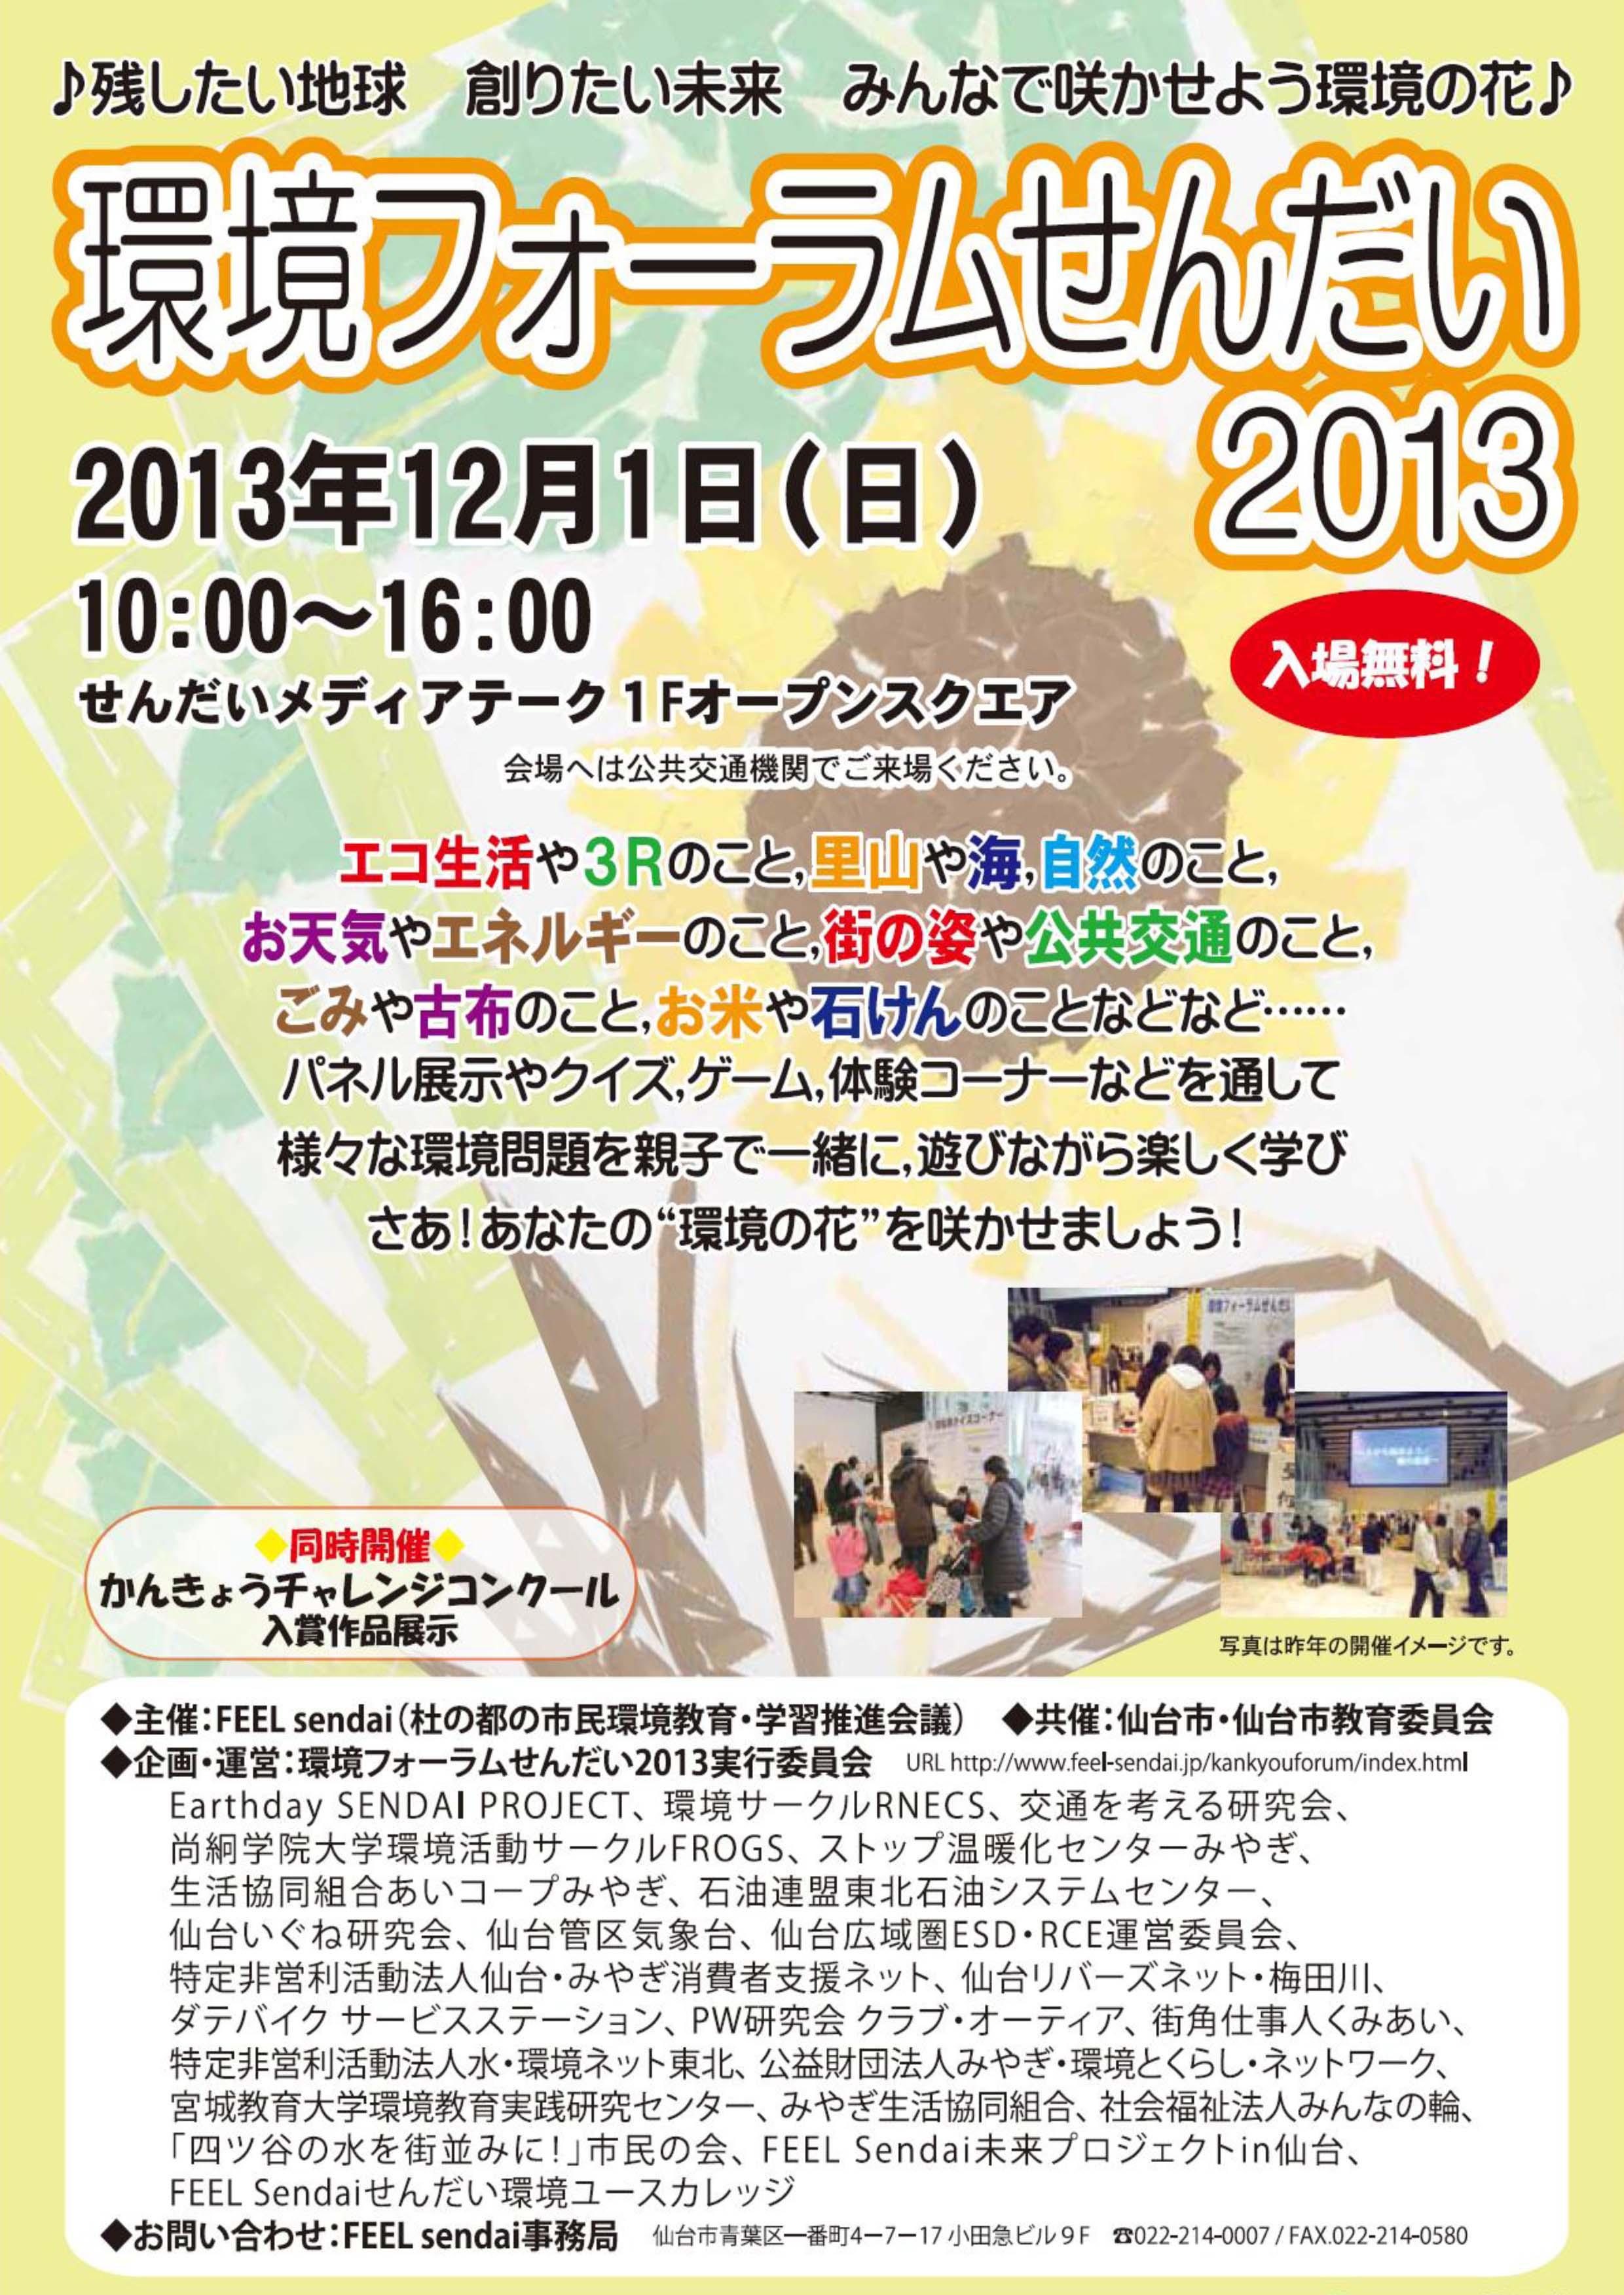 http://www.eec.miyakyo-u.ac.jp/blog/%E8%B3%87%E6%96%992-7chirashi2013-1.jpg